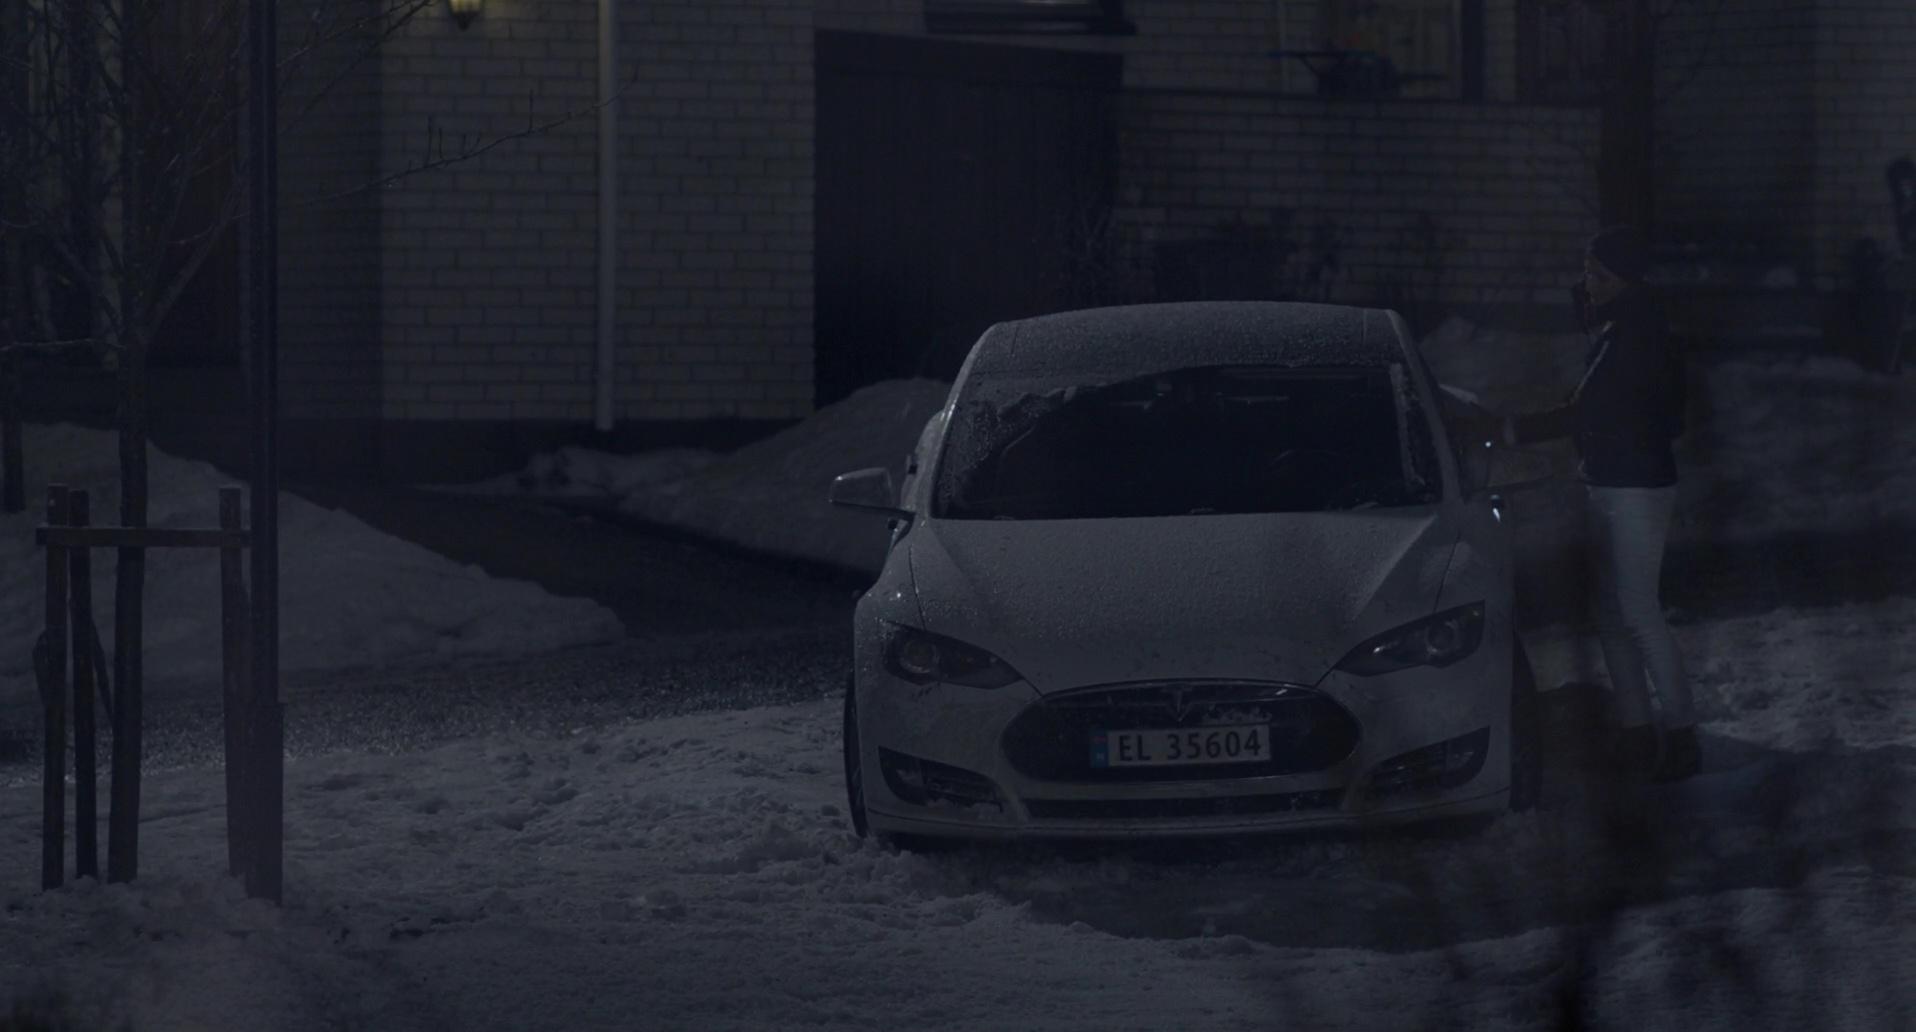 Tesla Model S Car in The Snowman (2017) Movie